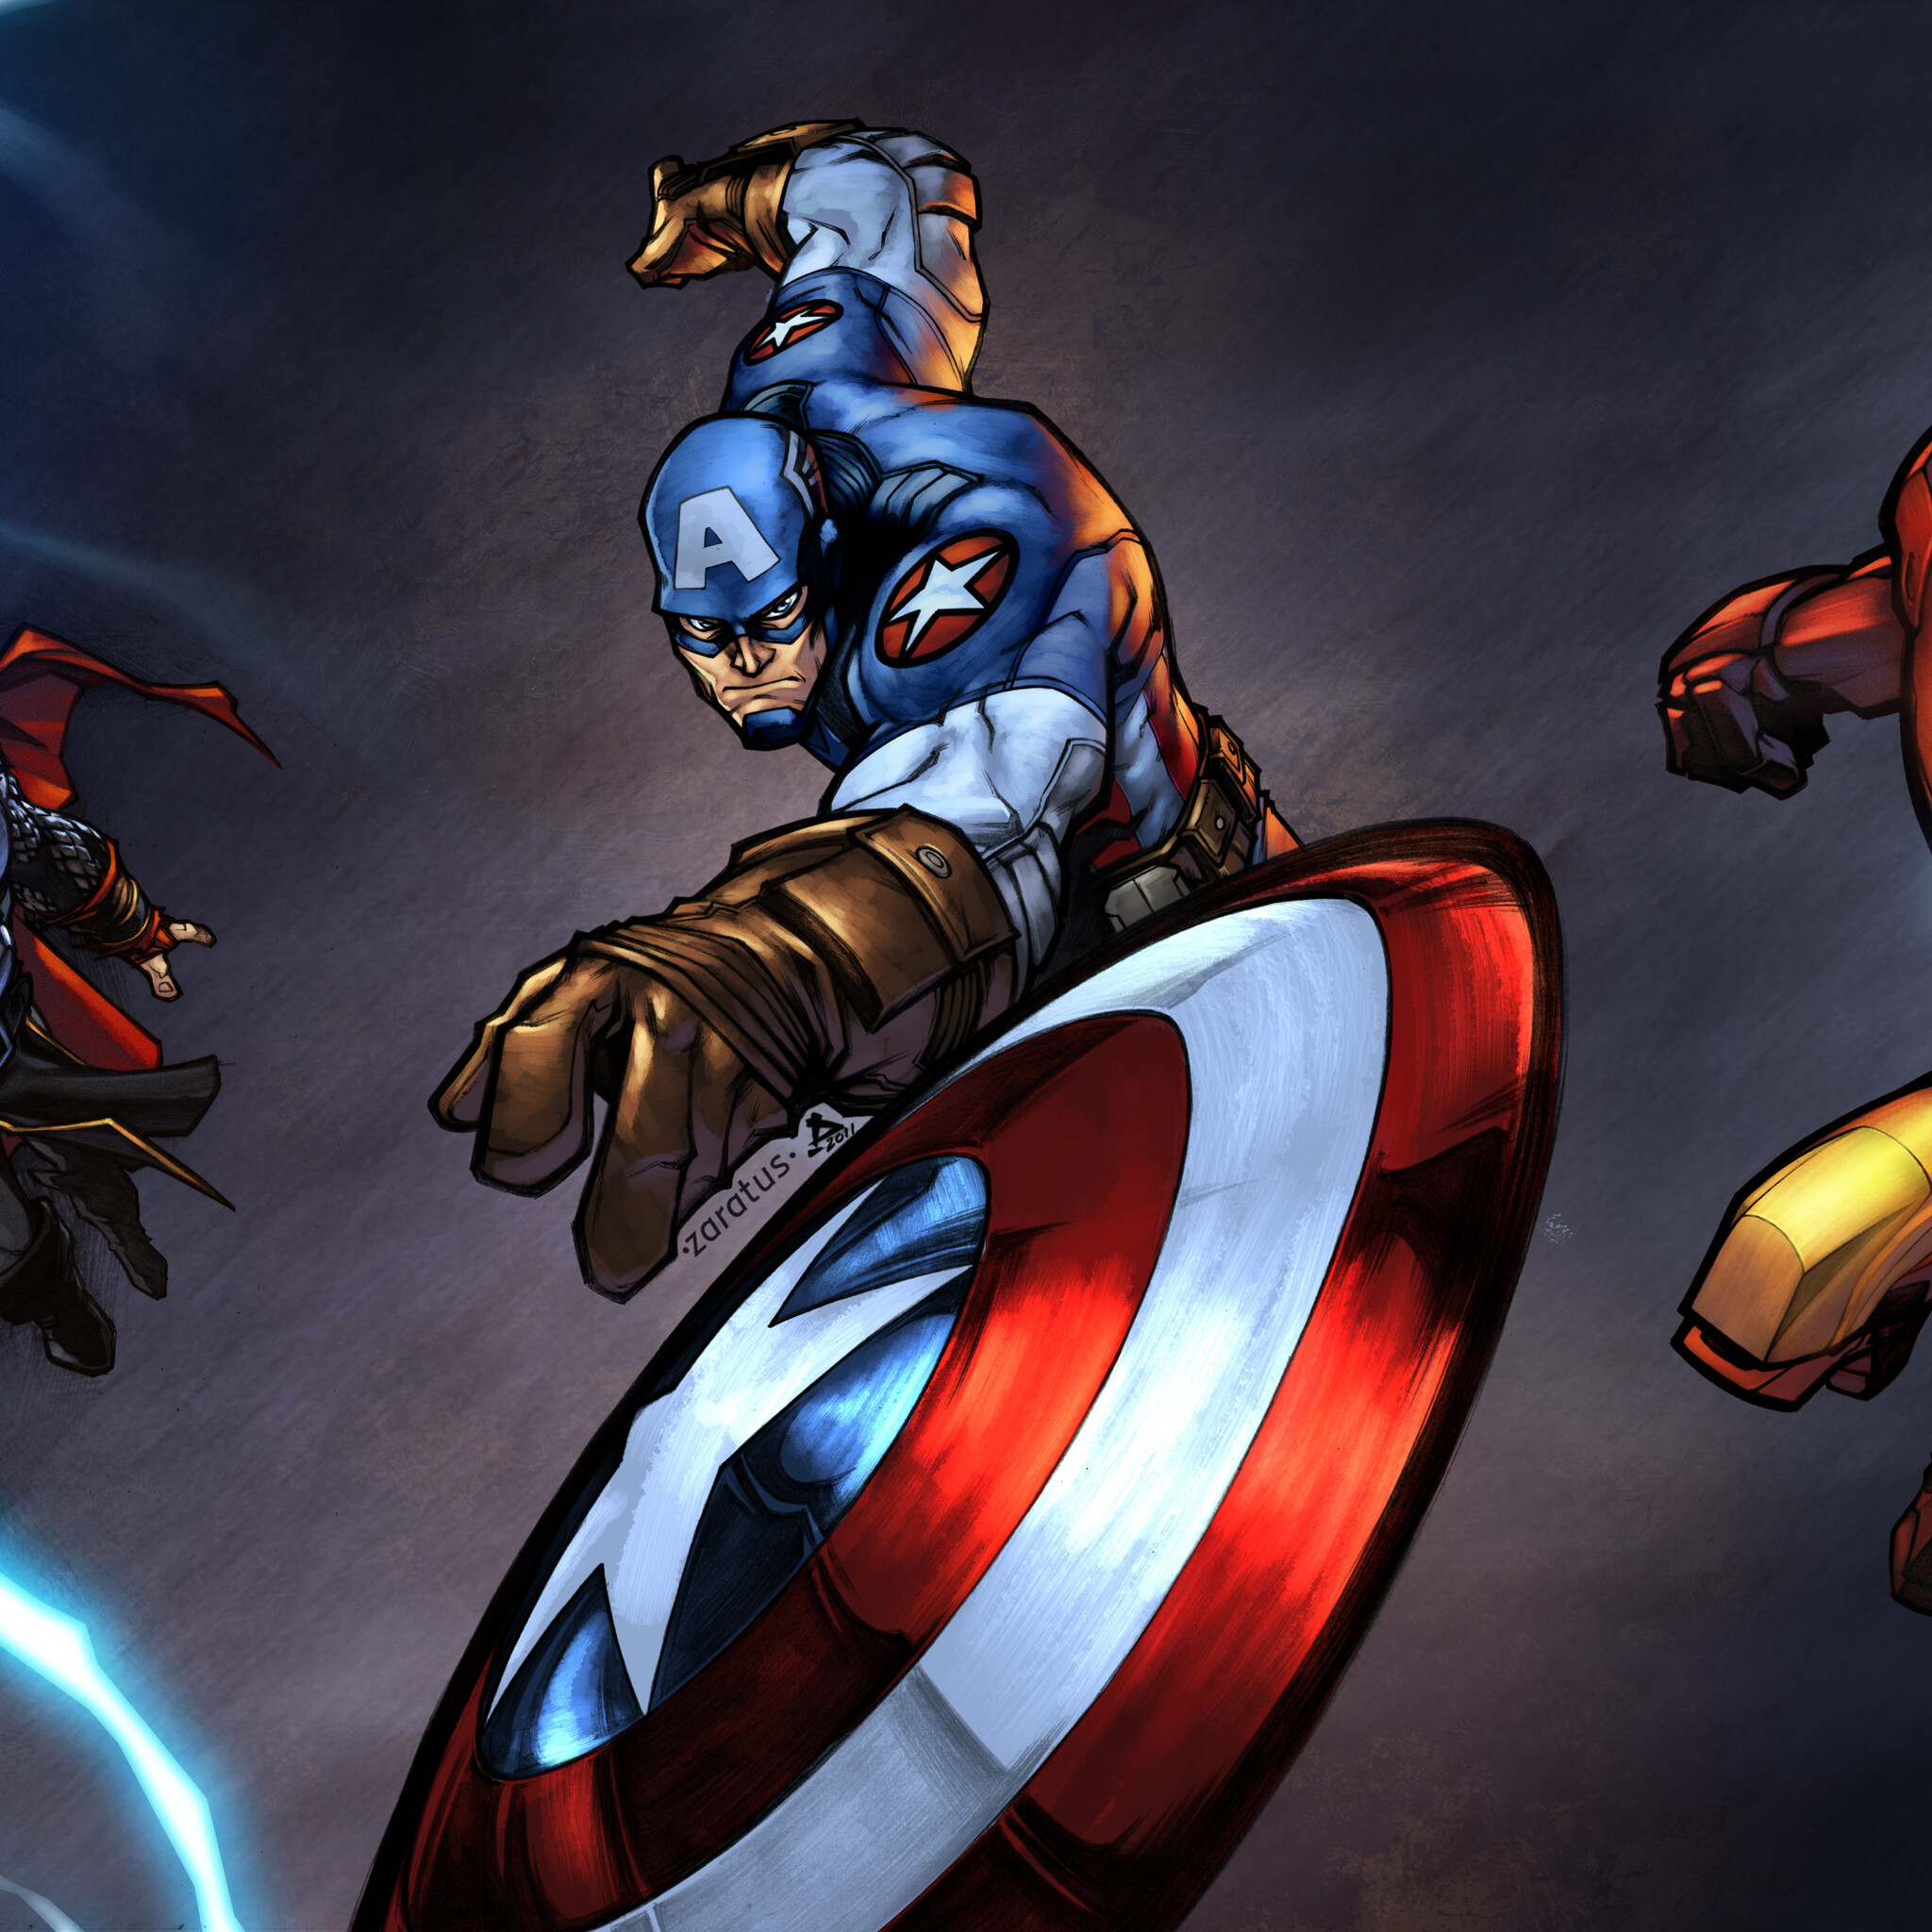 iron-man-captain-america-thor-10k-2y.jpg